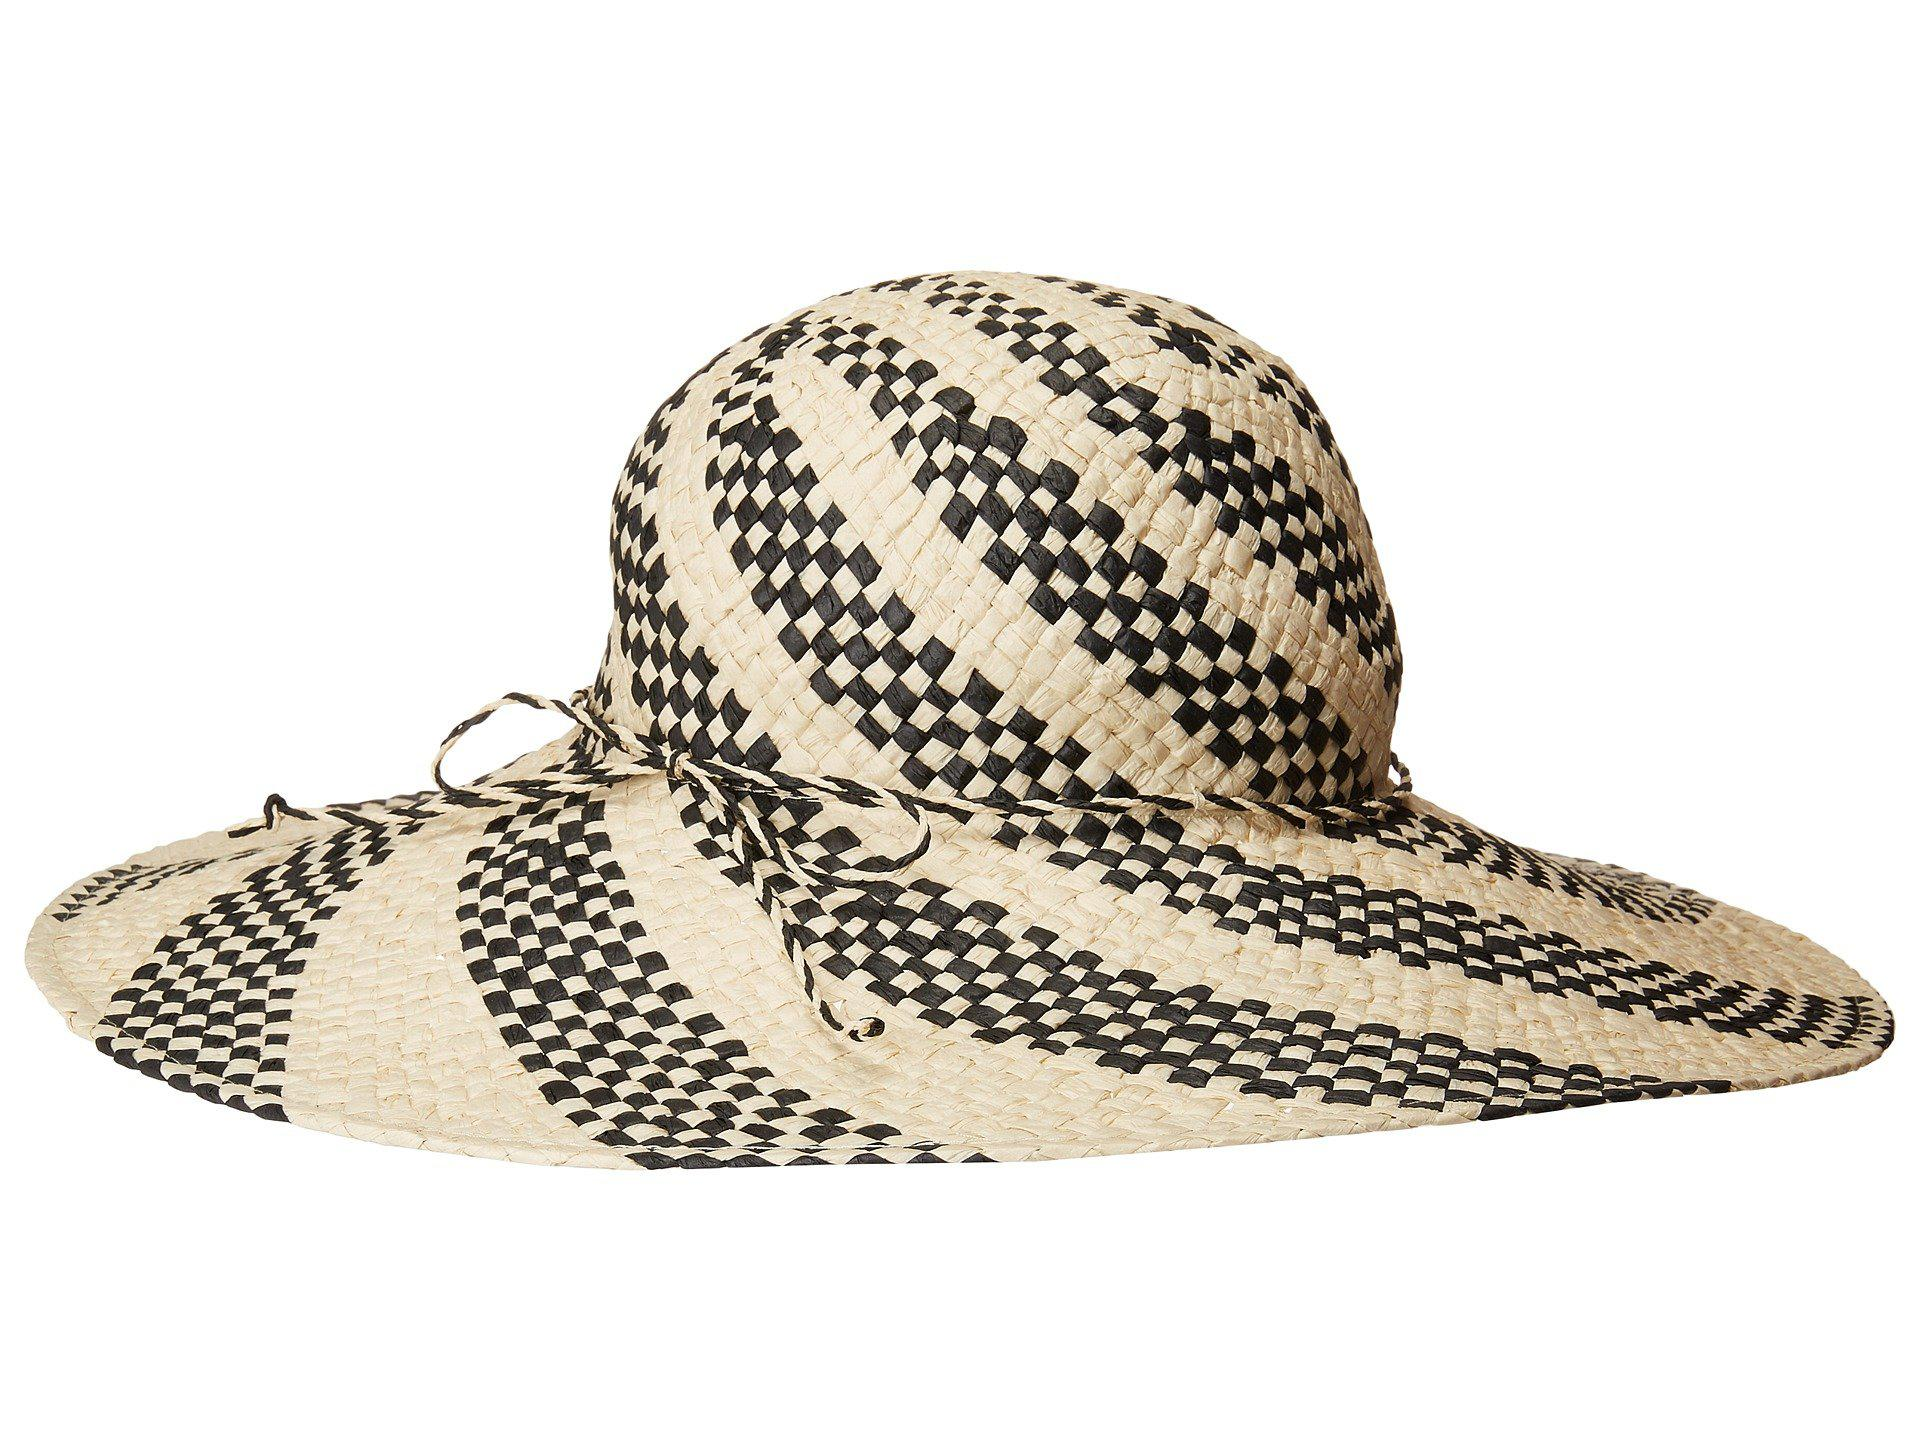 San Diego Hat Company - Multicolor Pbl3089os Spiral Woven Paper Sun Brim ( natural) Caps. View fullscreen d42adaab74d6